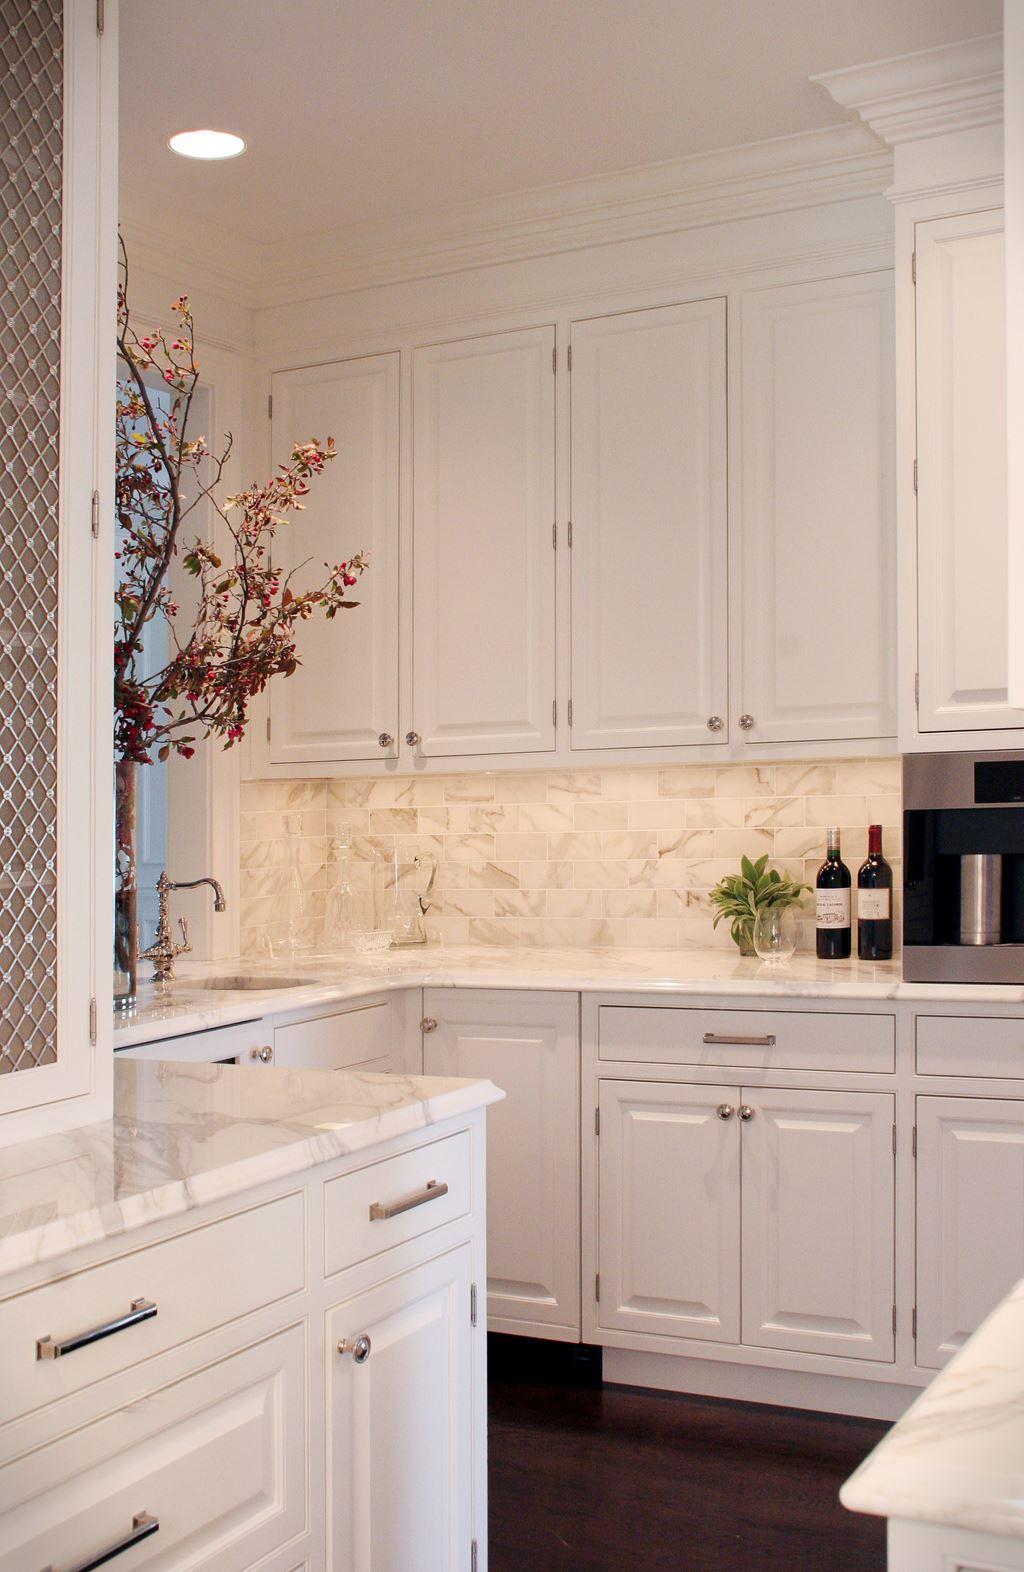 The Classic White Kitchen Deconstructed | Sub-Zero, Wolf ...